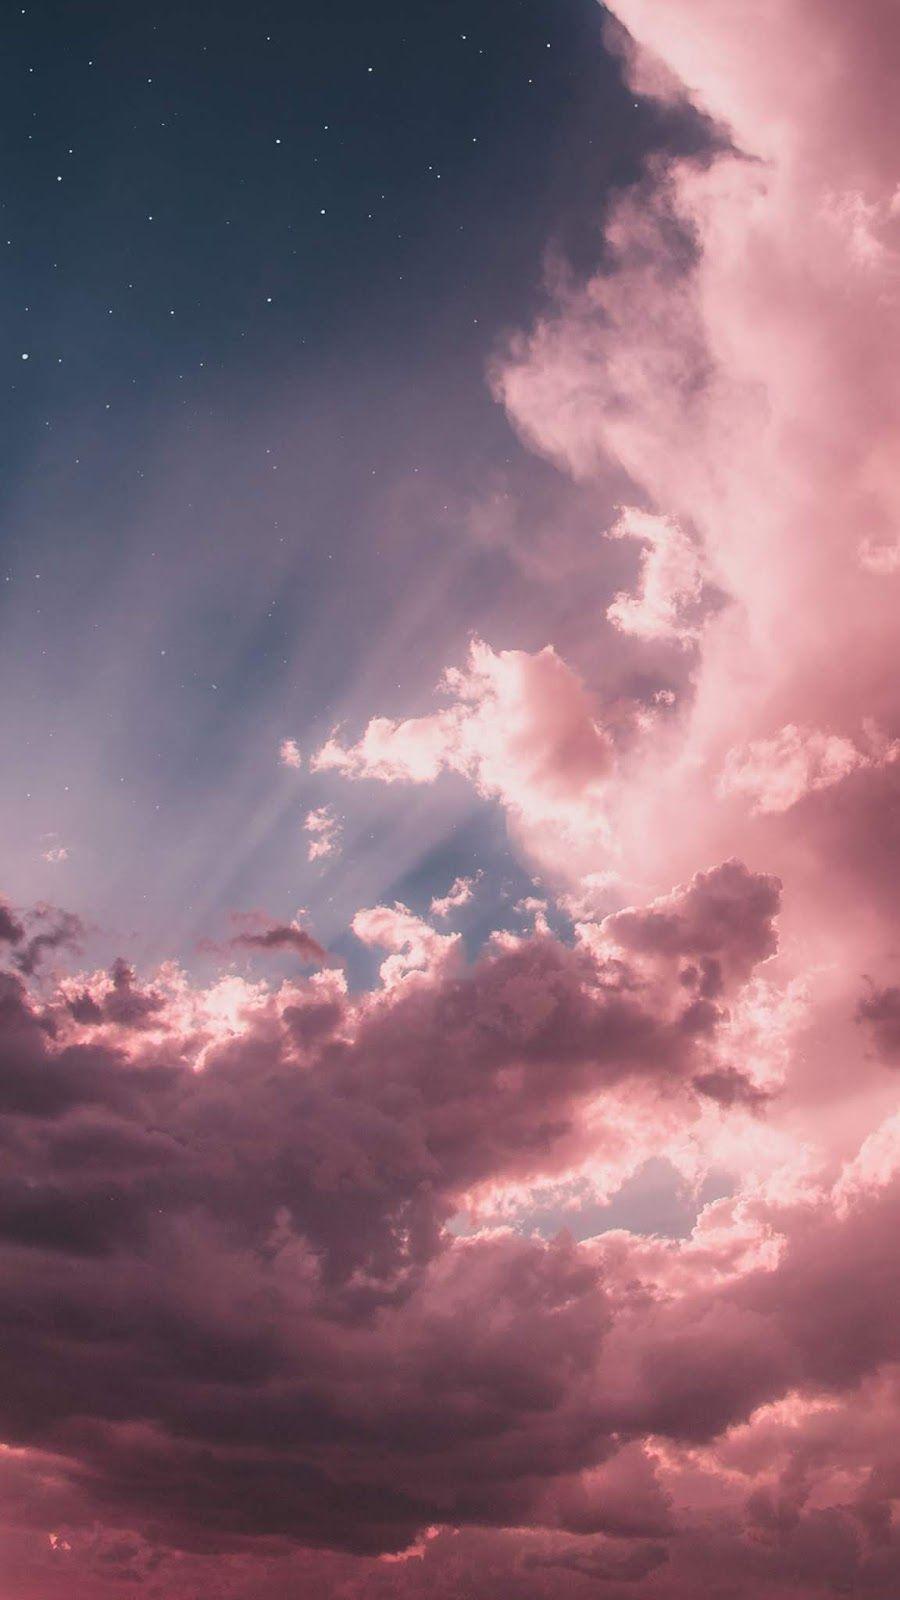 Pink Clouds Wallpapers Cloud Wallpaper Sky Aesthetic